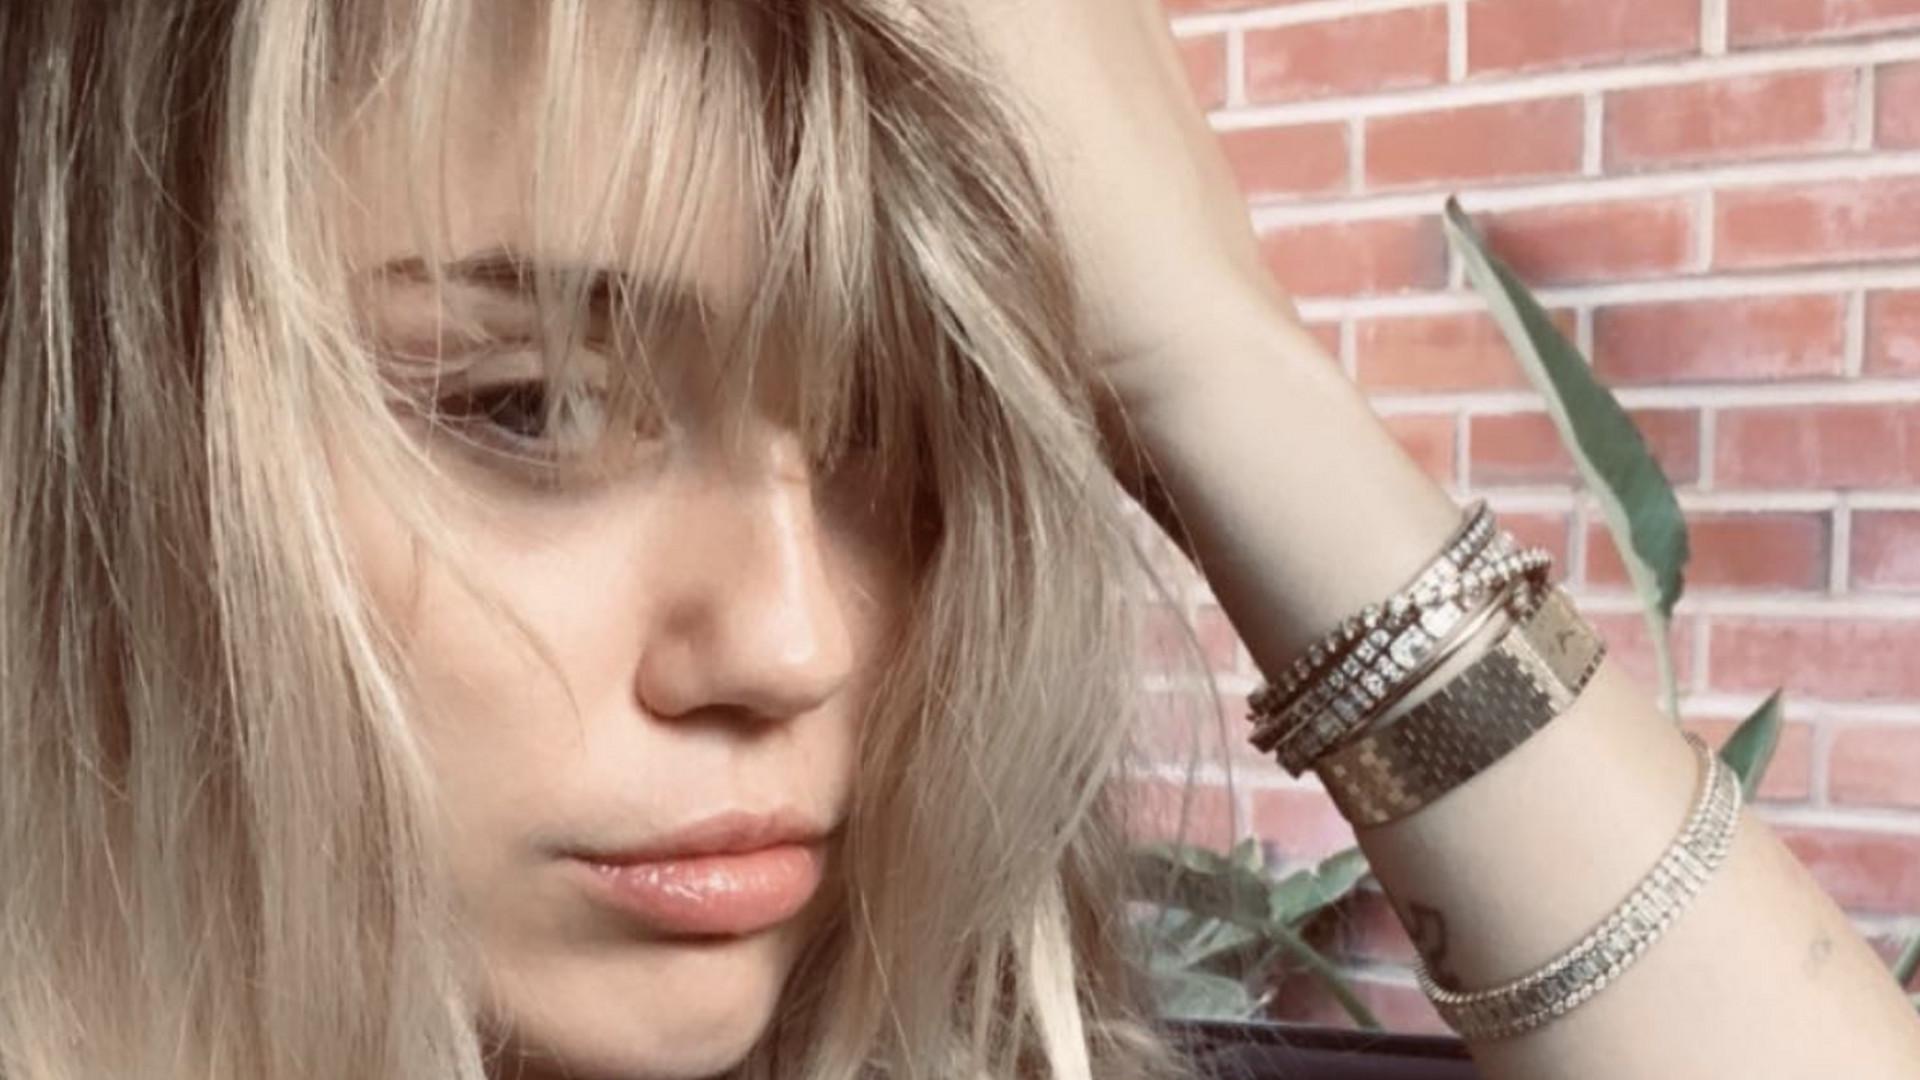 Miley Cyrus Als Hannah Montana Frisur Deutet Auf Comeback Der